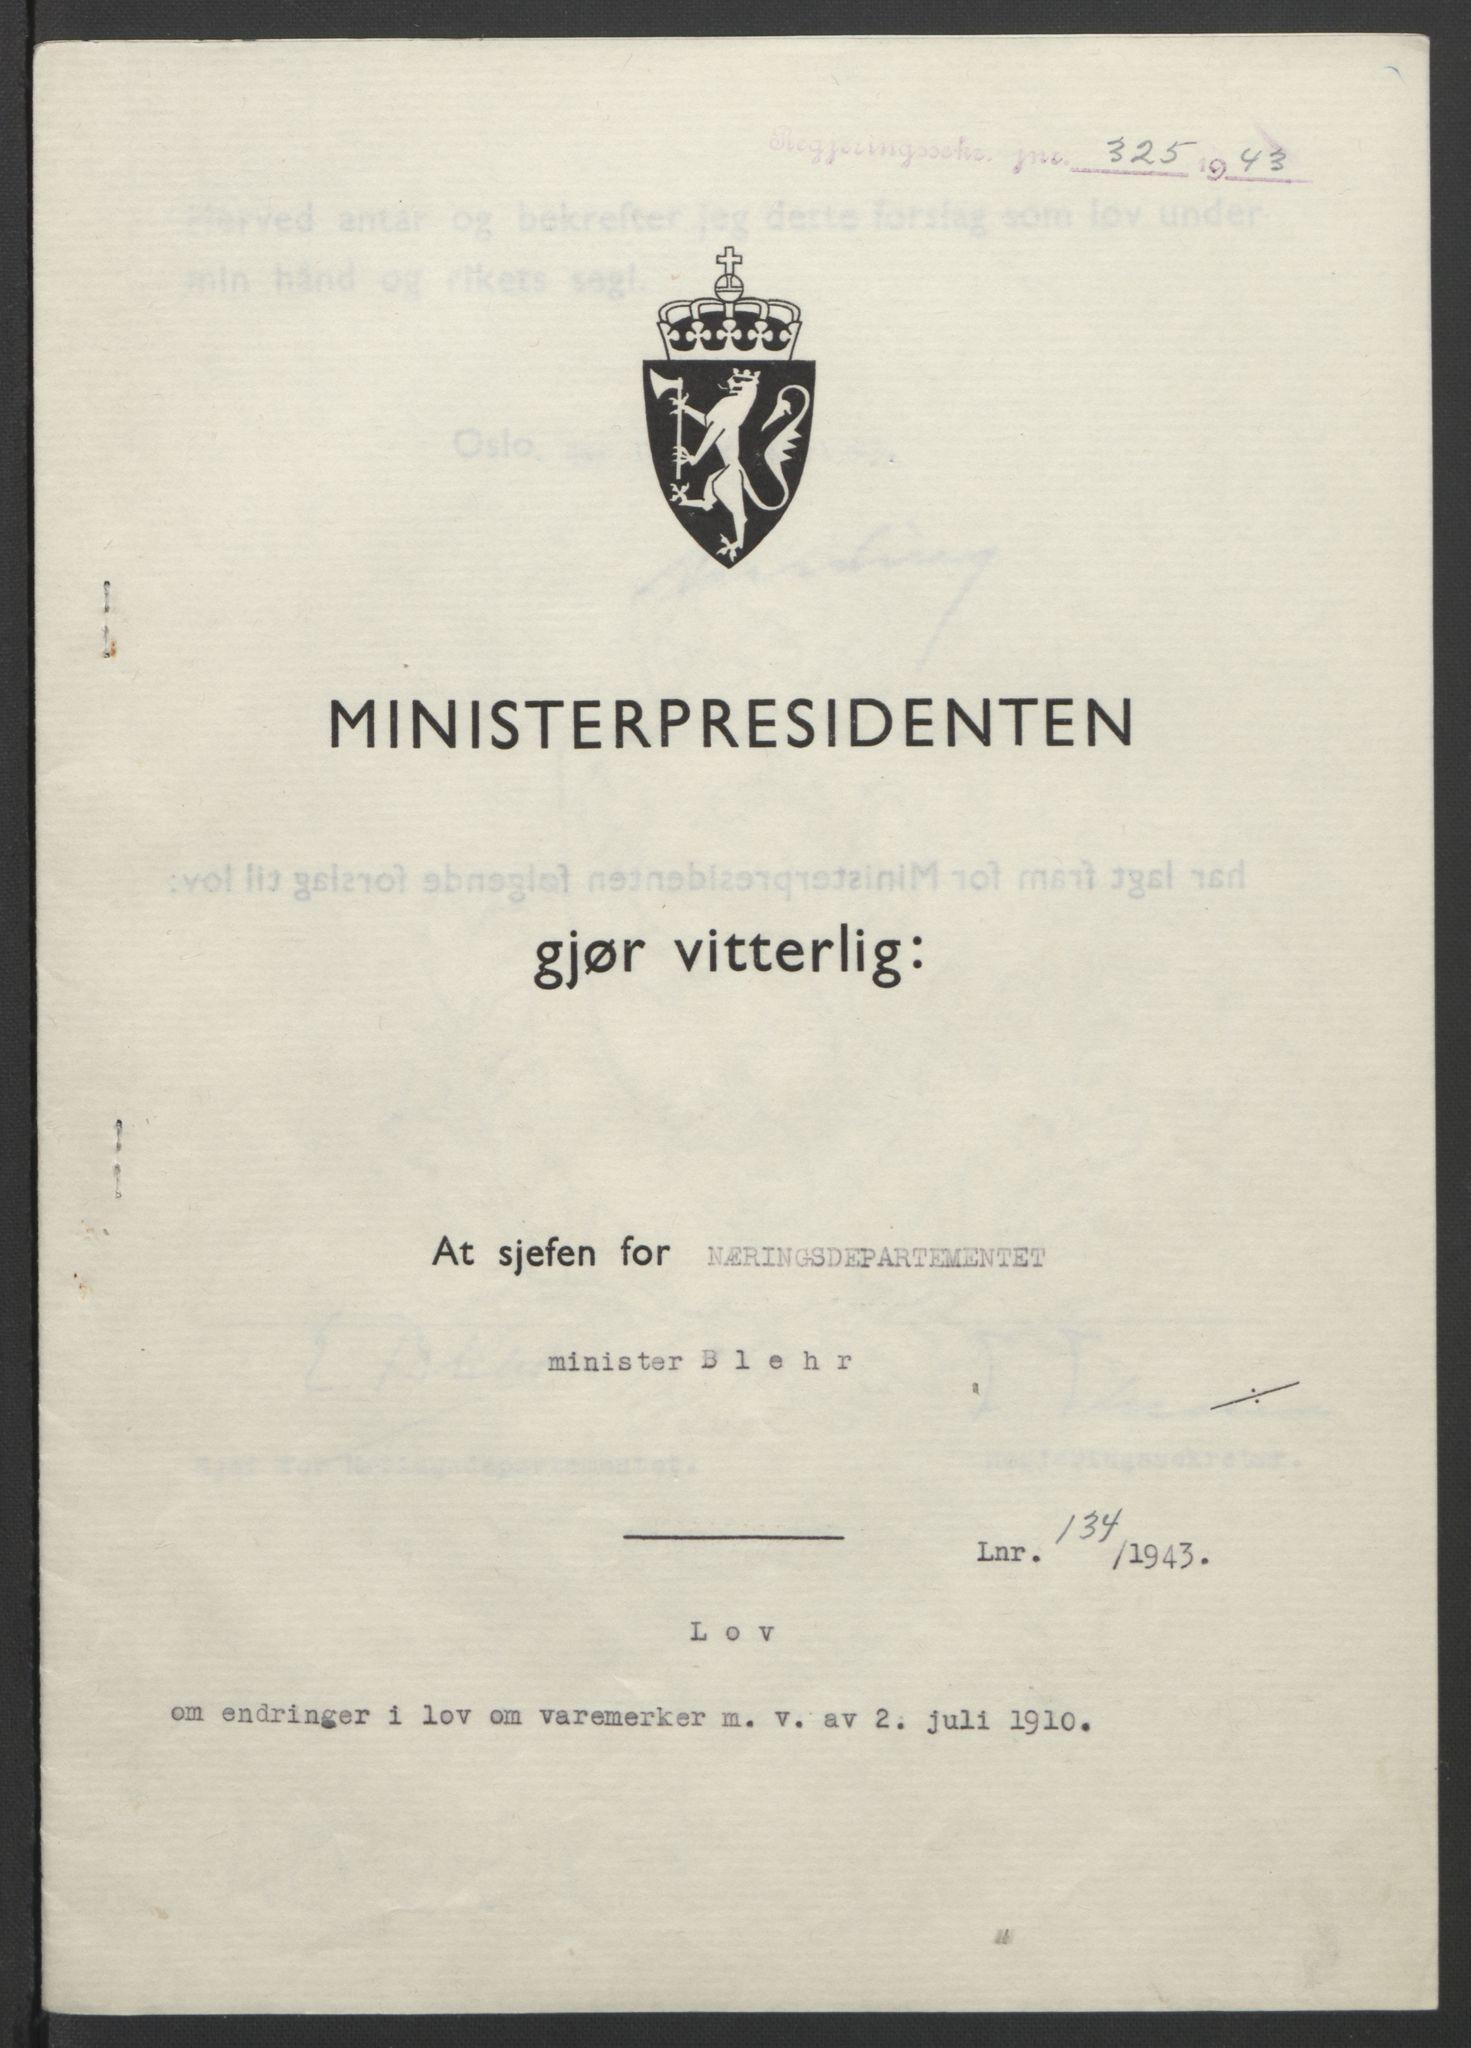 RA, NS-administrasjonen 1940-1945 (Statsrådsekretariatet, de kommisariske statsråder mm), D/Db/L0099: Lover, 1943, s. 624